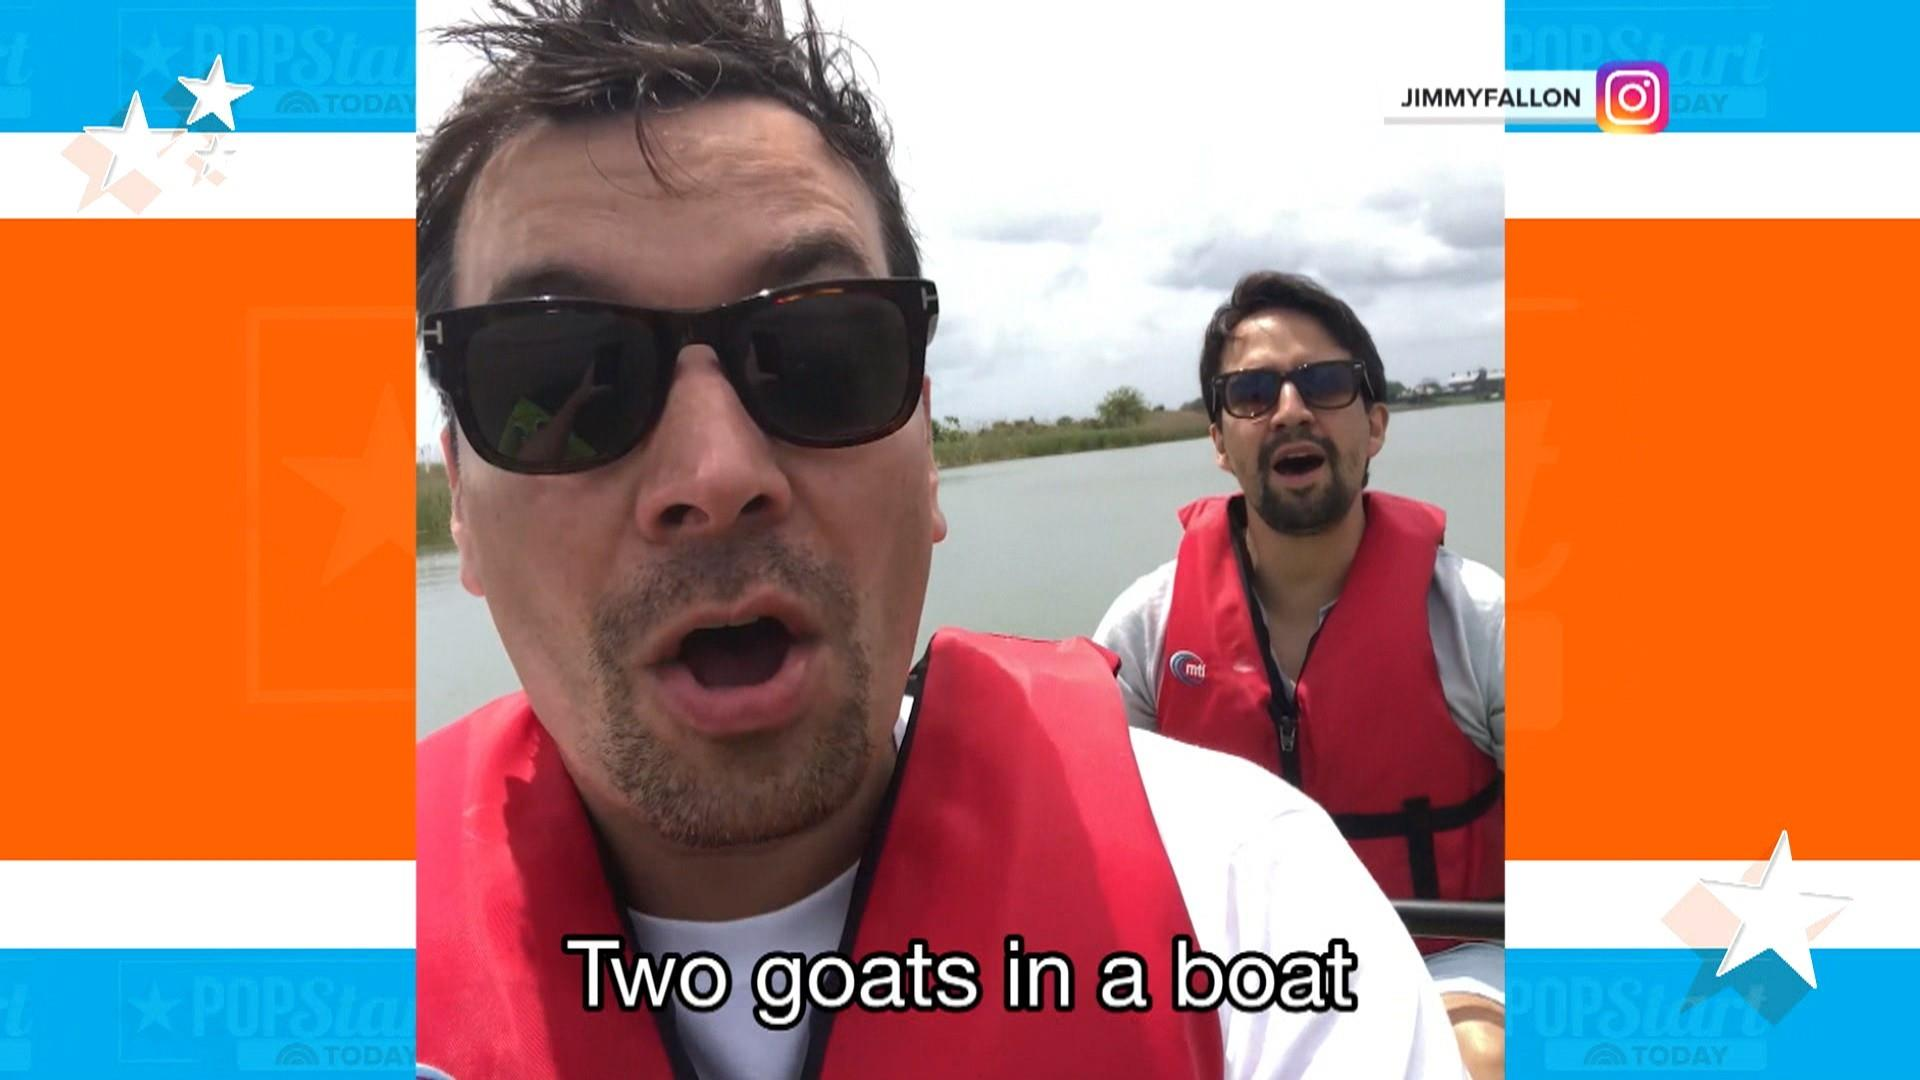 Jimmy Fallon and Lin-Manuel Miranda bond over their goatees